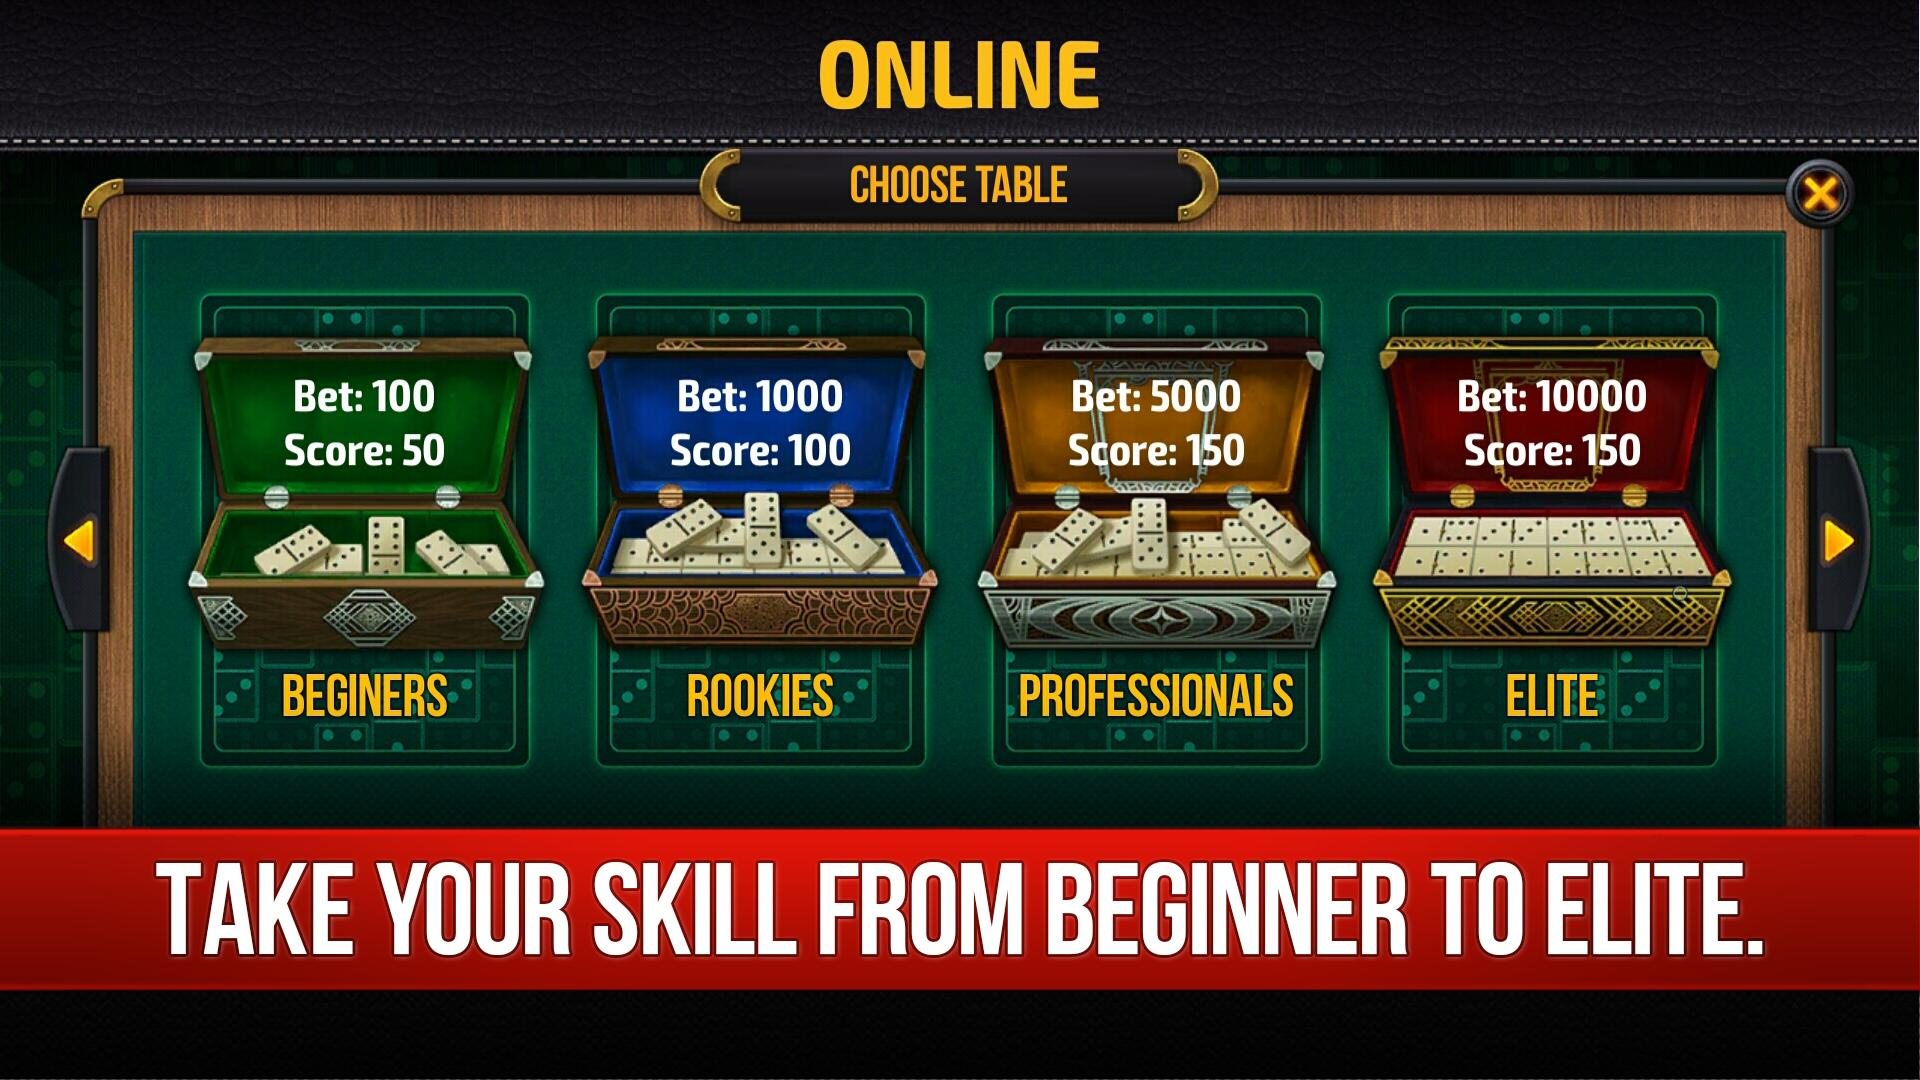 Domino - Dominoes online. Play free Dominos! 2.9.2 Screenshot 5